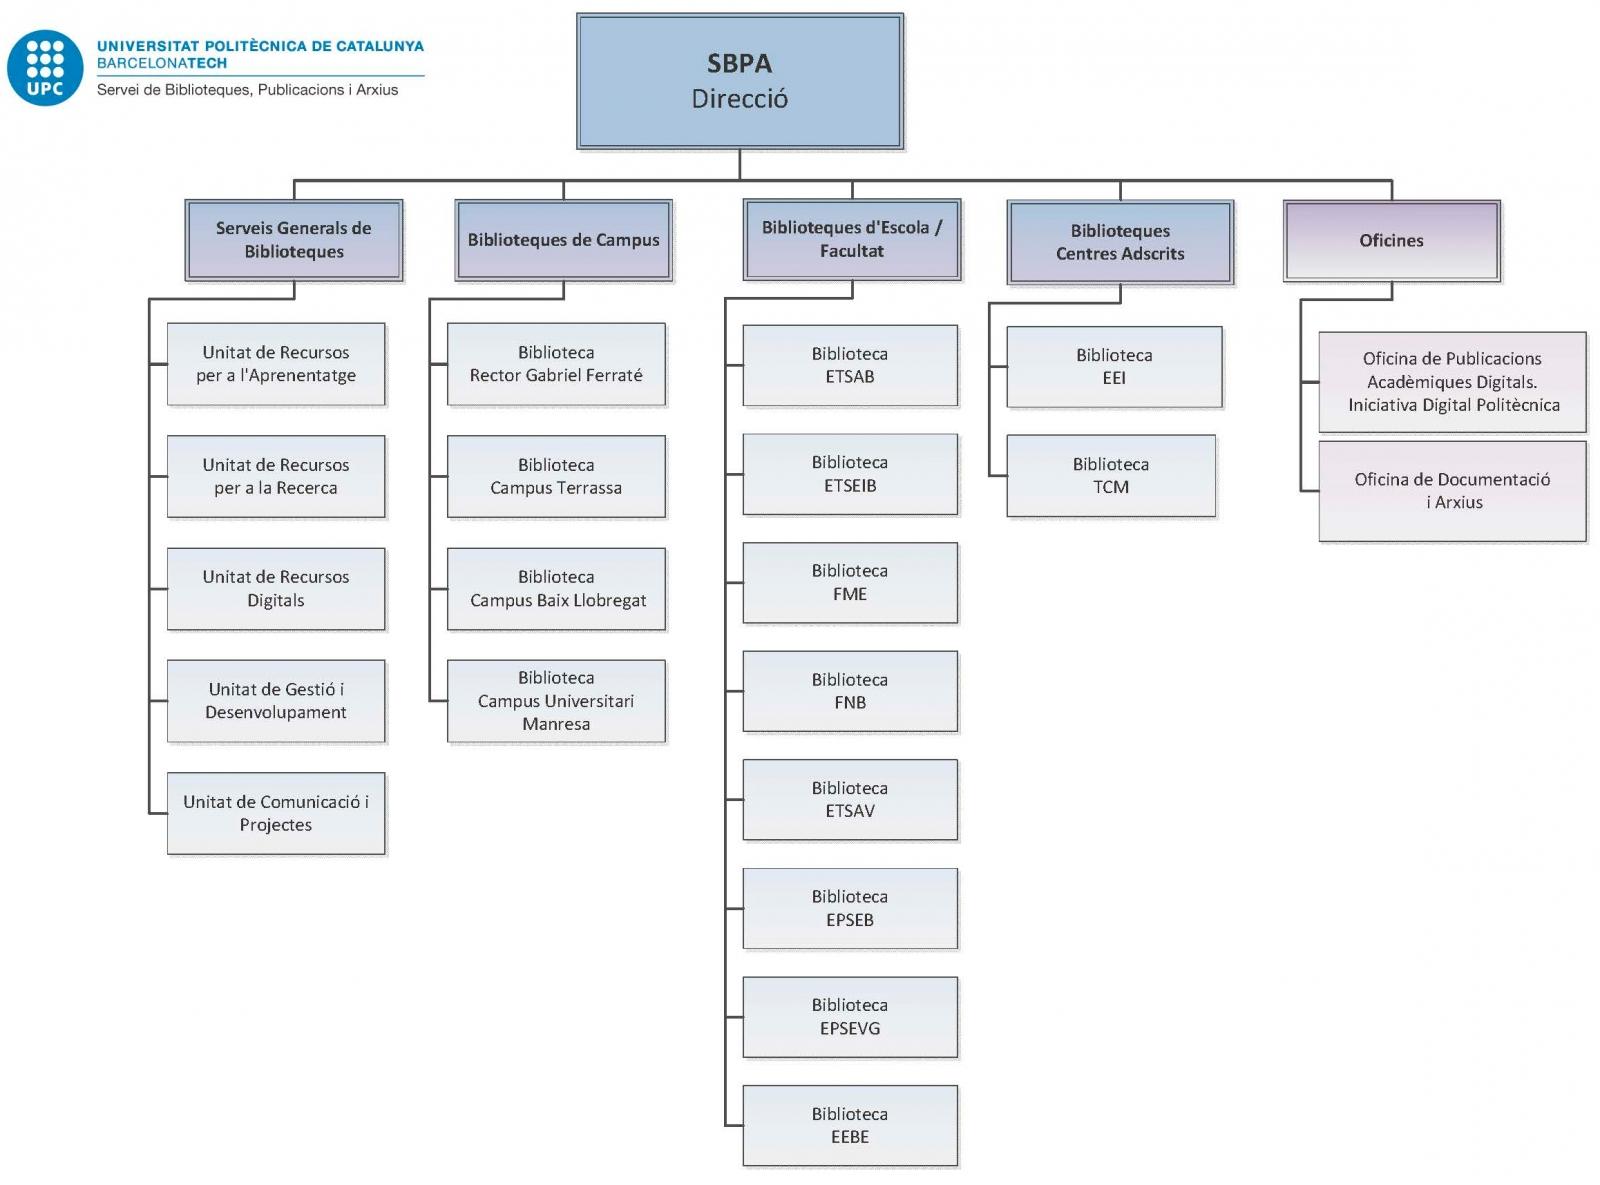 Organization chart of the SBPA - 2018